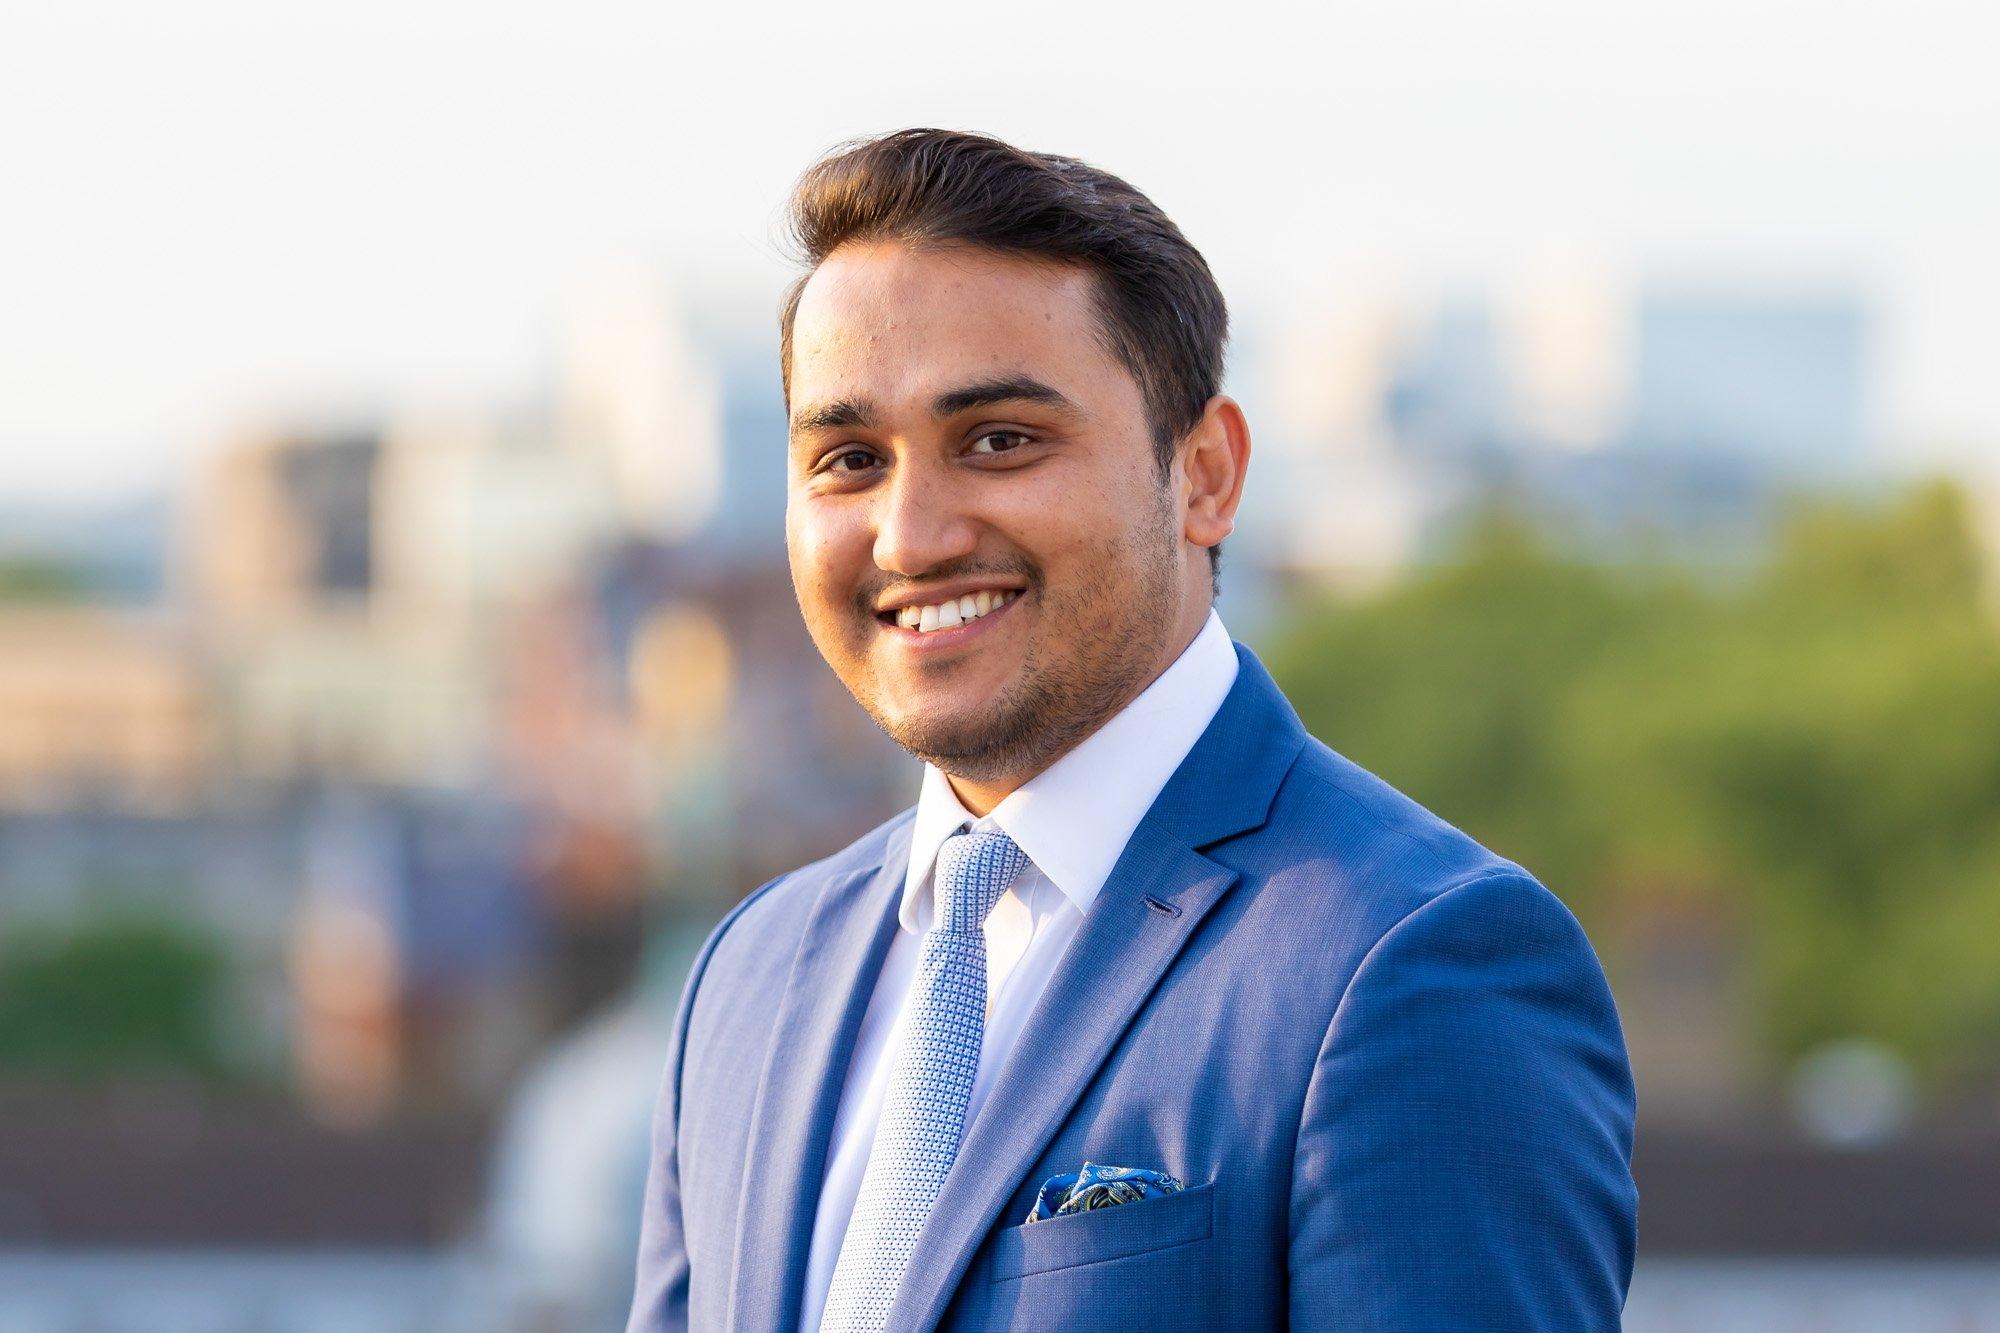 Pradeep Singh Entrepreneur University of Cambridge